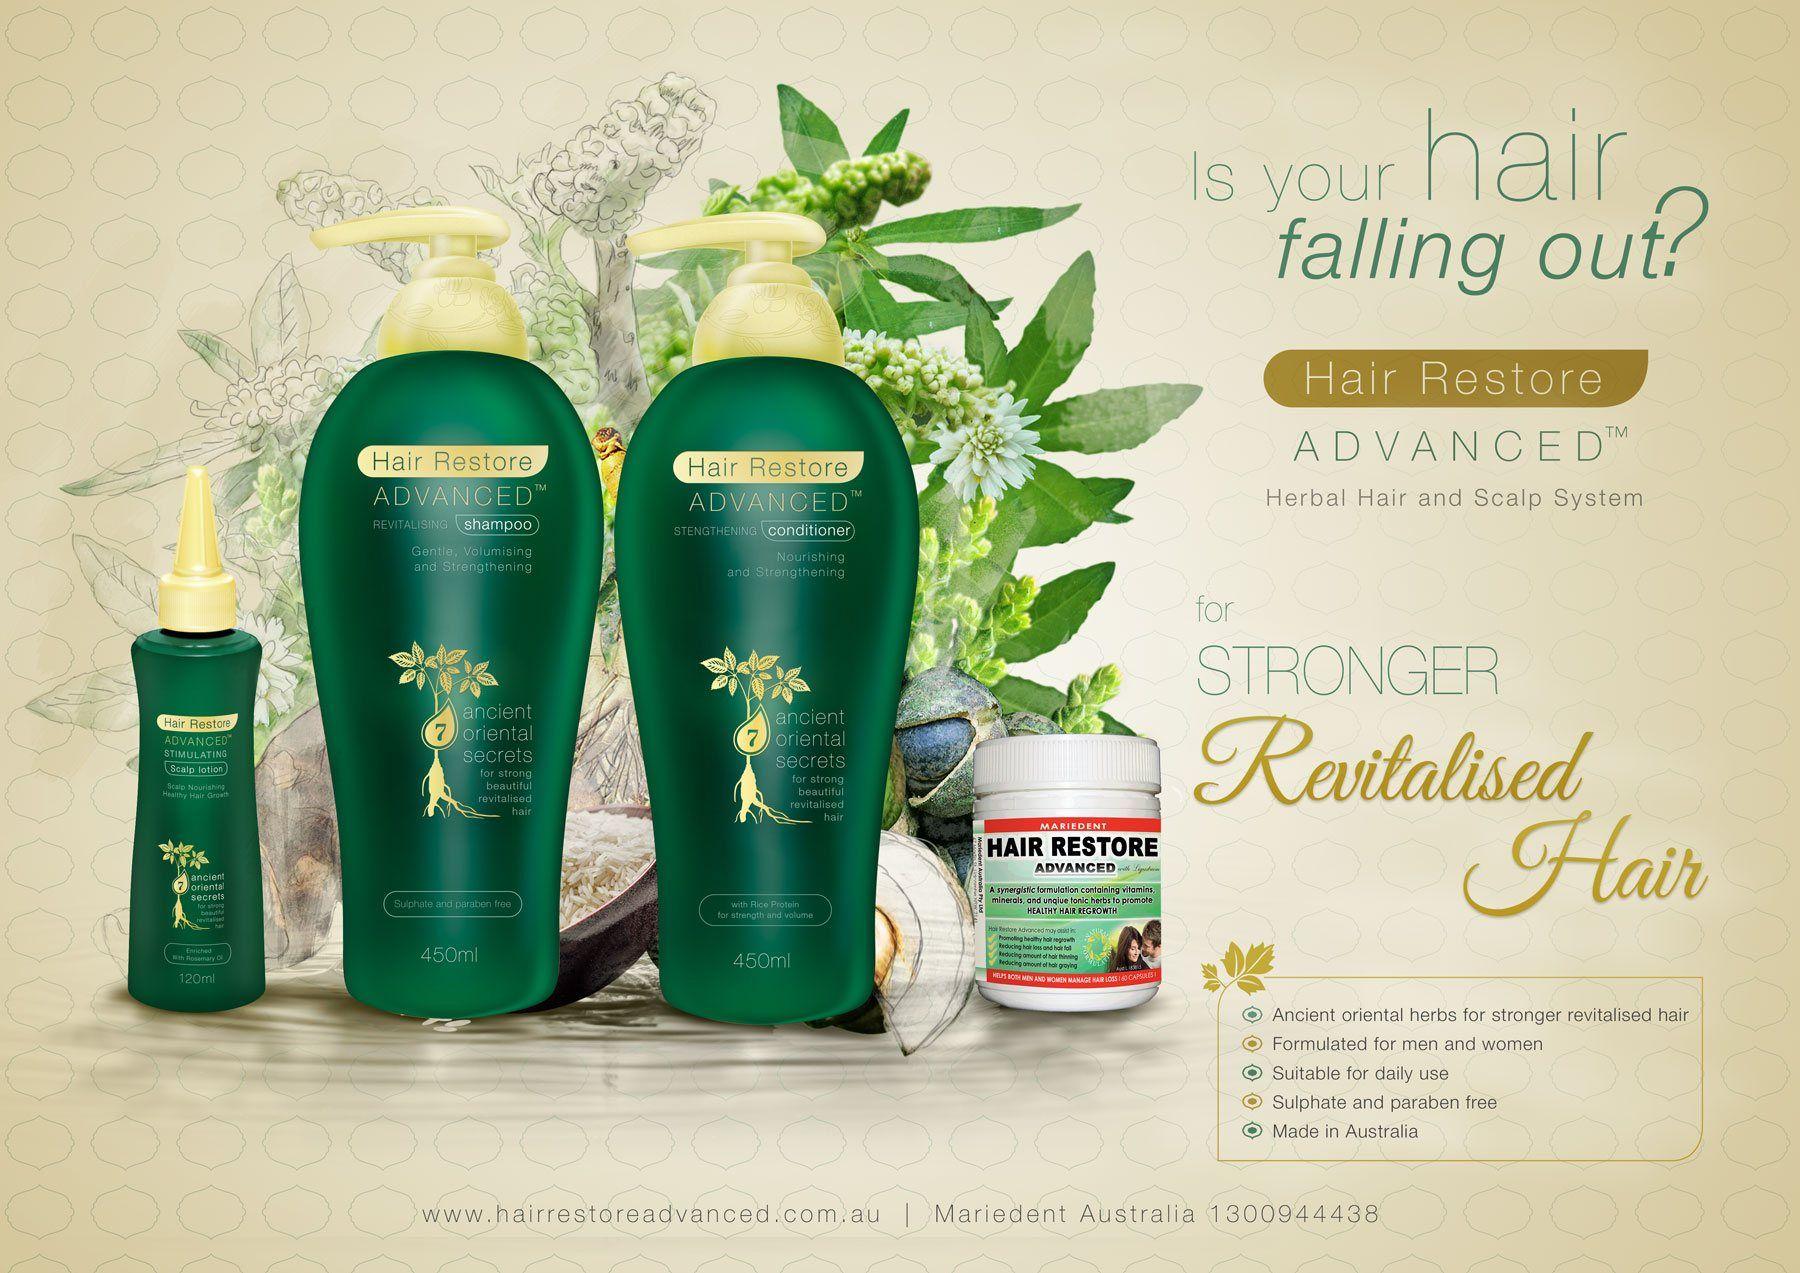 Hair Restore Advanced Leading Australian Brand of Hair